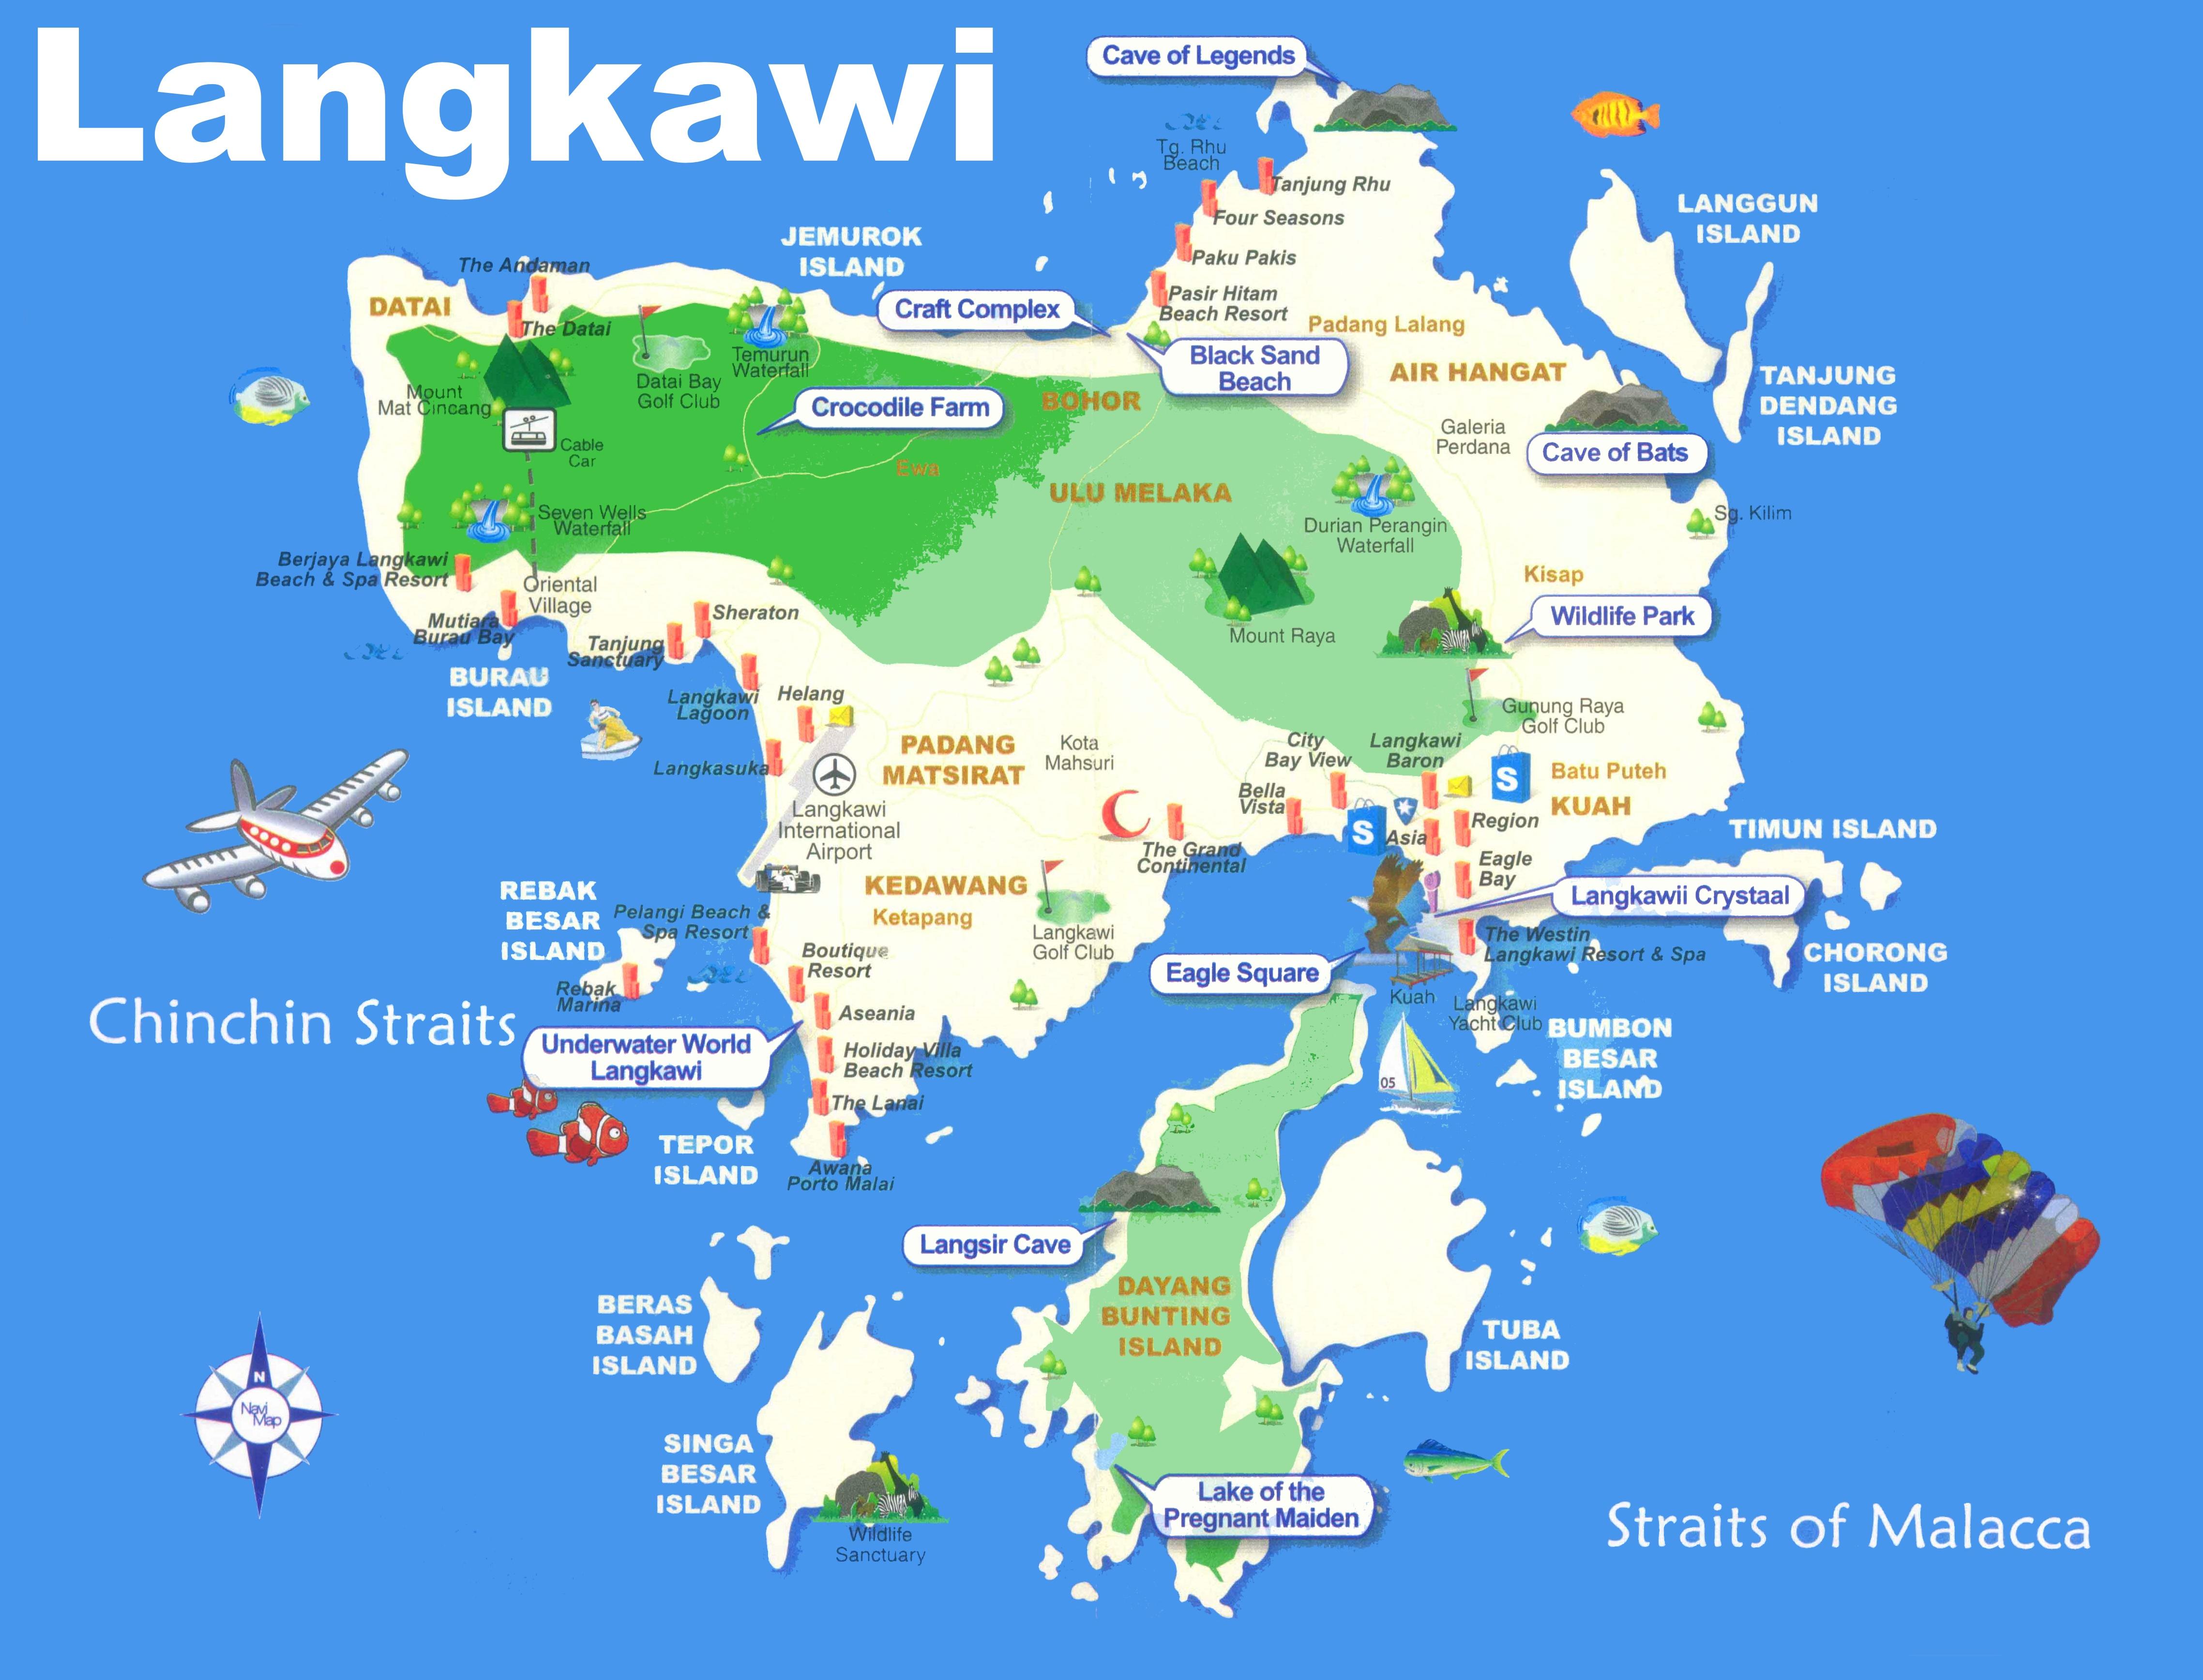 Map Of Malaysia And Langkawi Langkawi tourist map